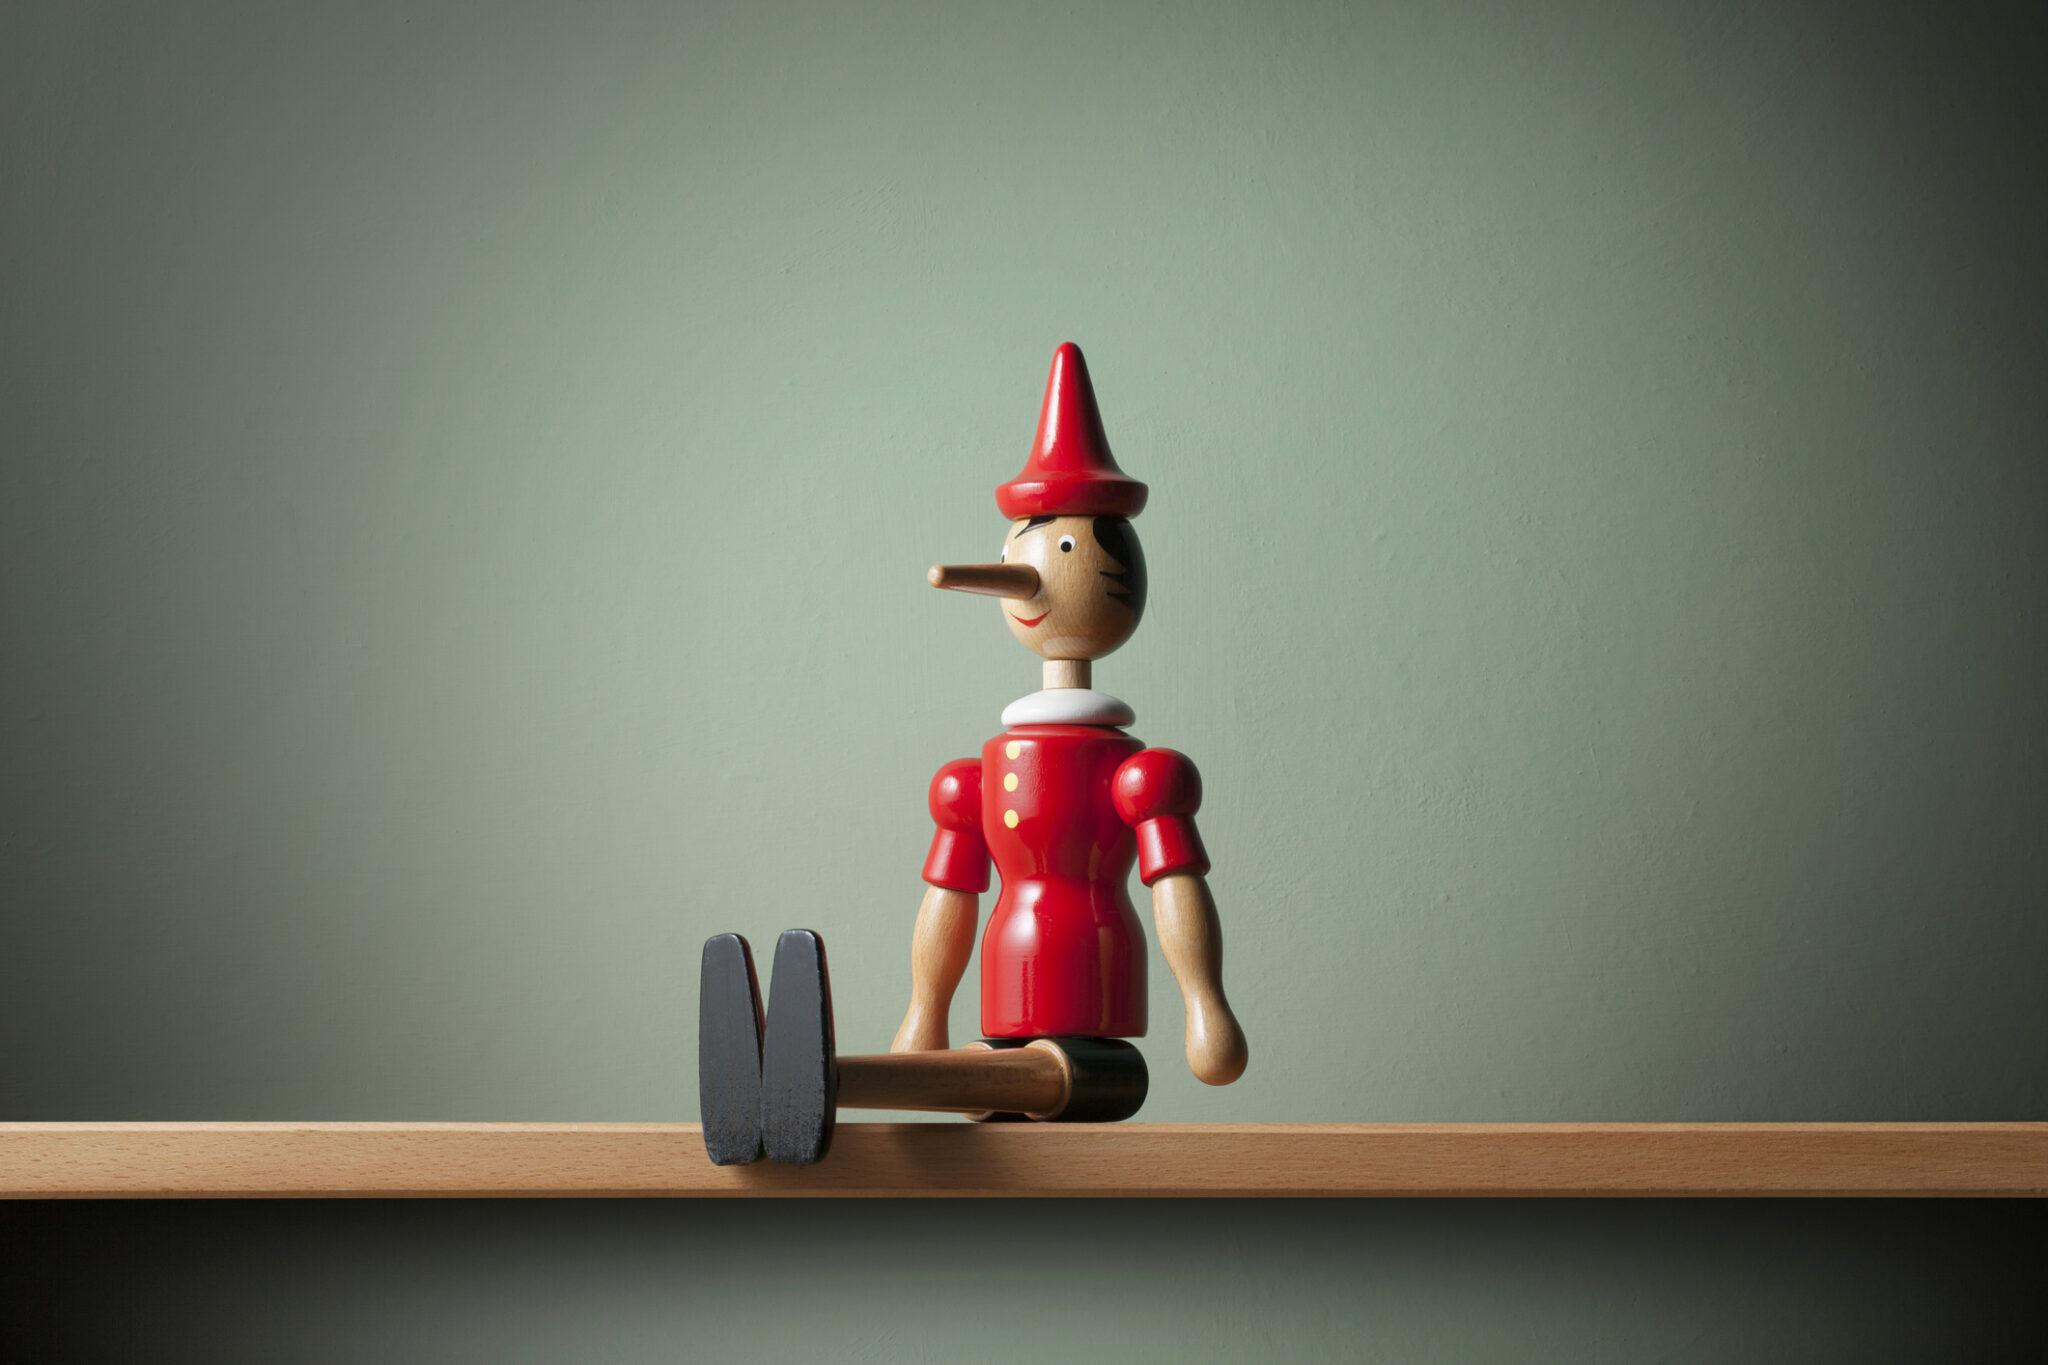 Pinocchio on the shelf